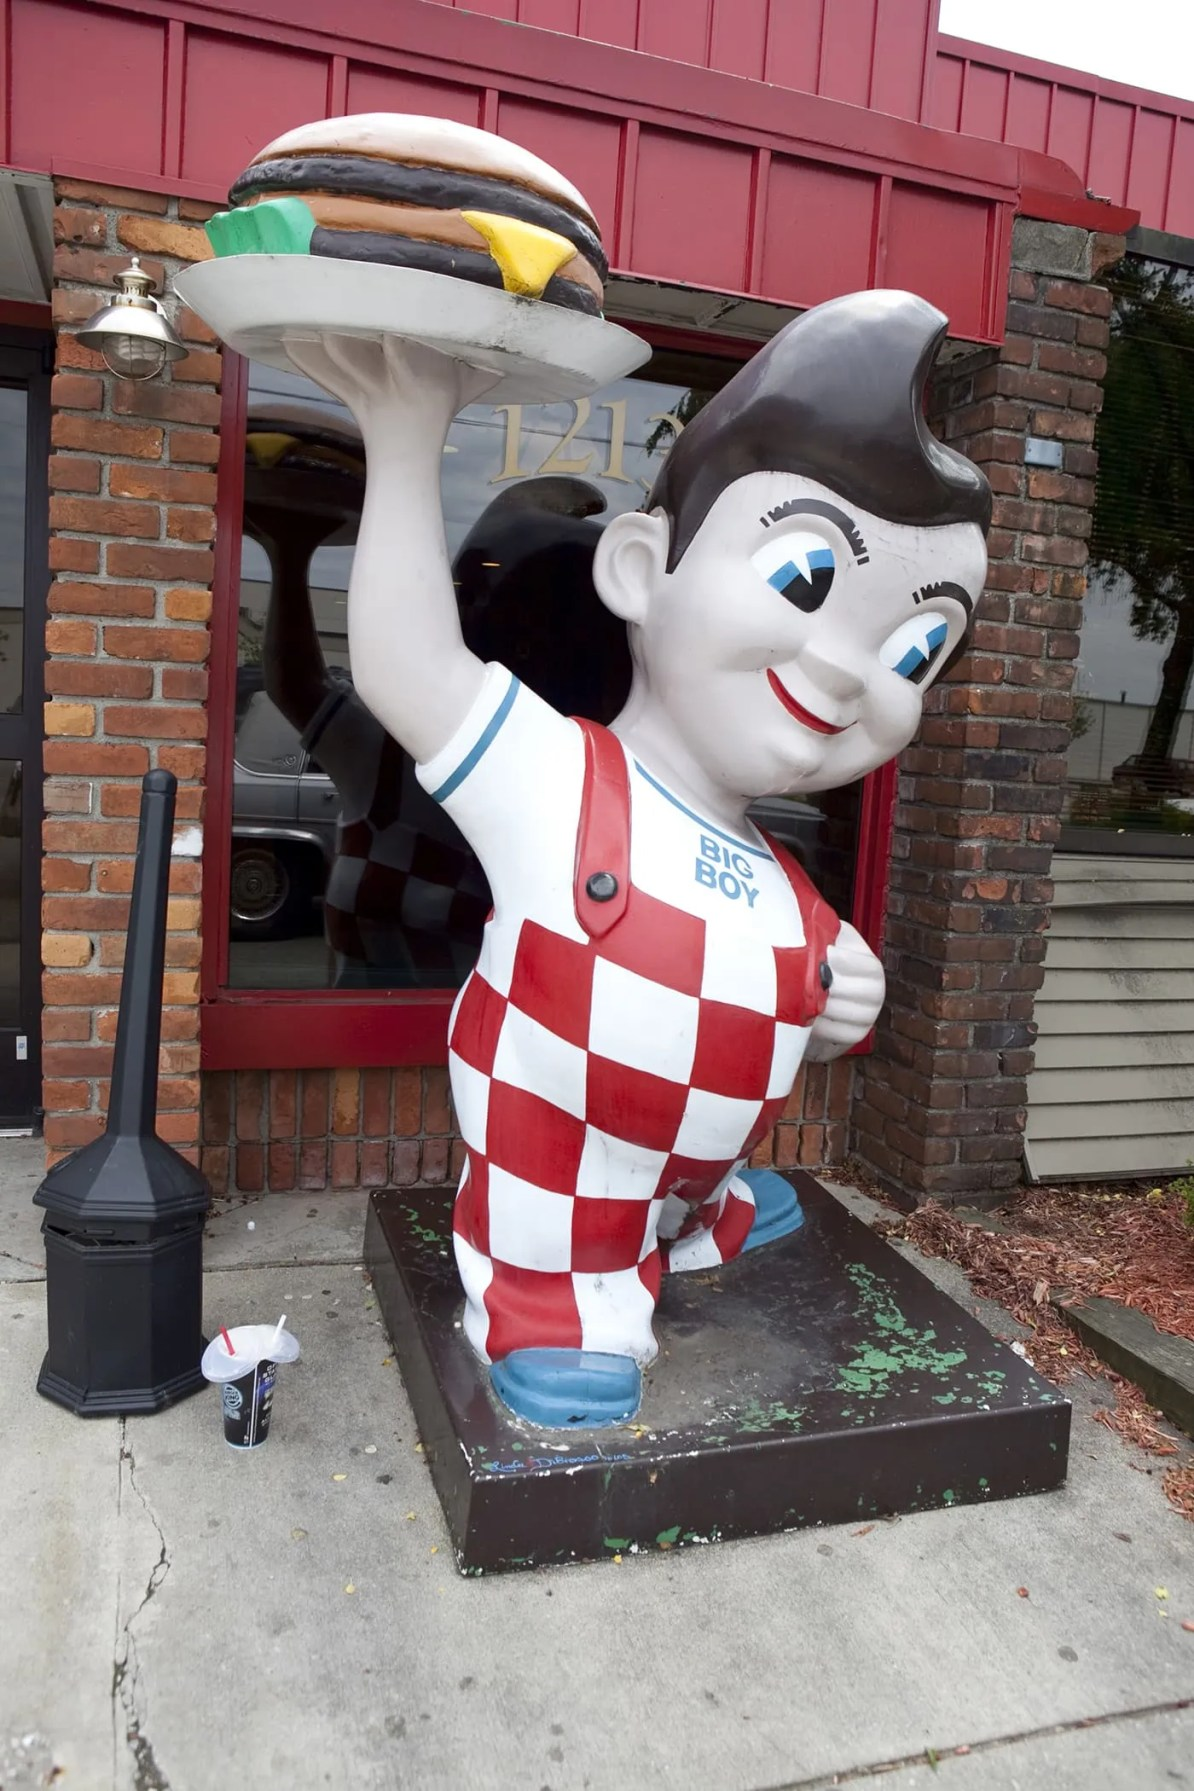 Big Boy Statue - I-94 Exit 138 in Michigan